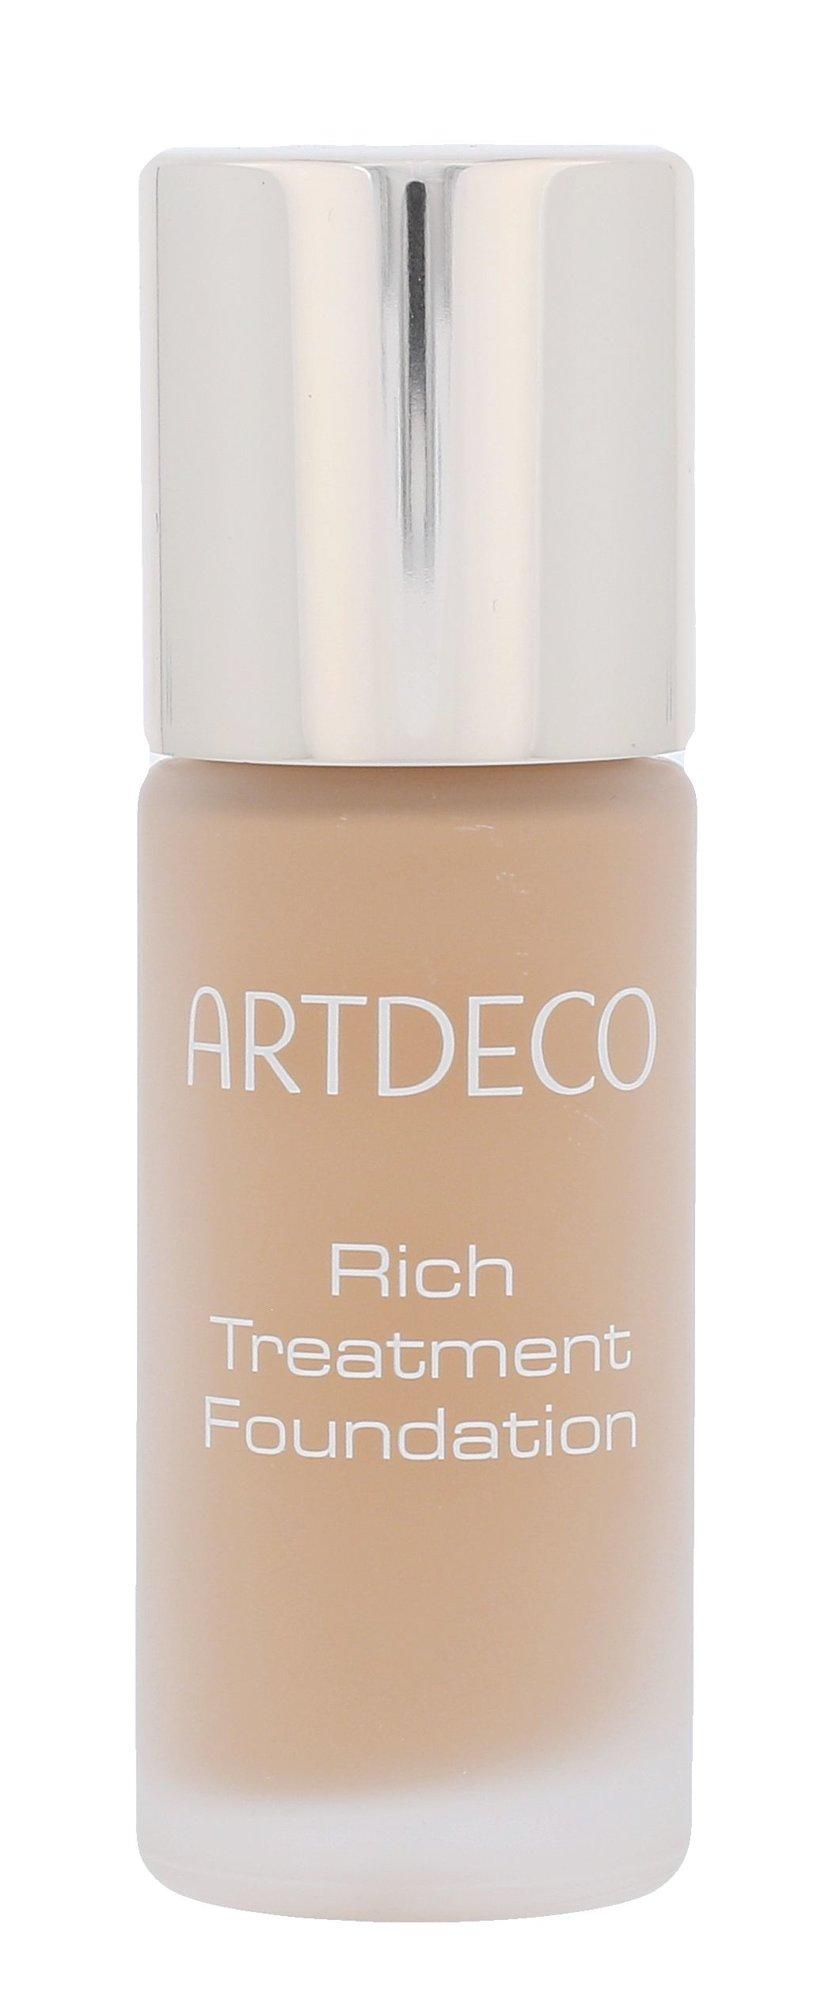 Artdeco Rich Treatment Cosmetic 20ml 17 Creamy Honey